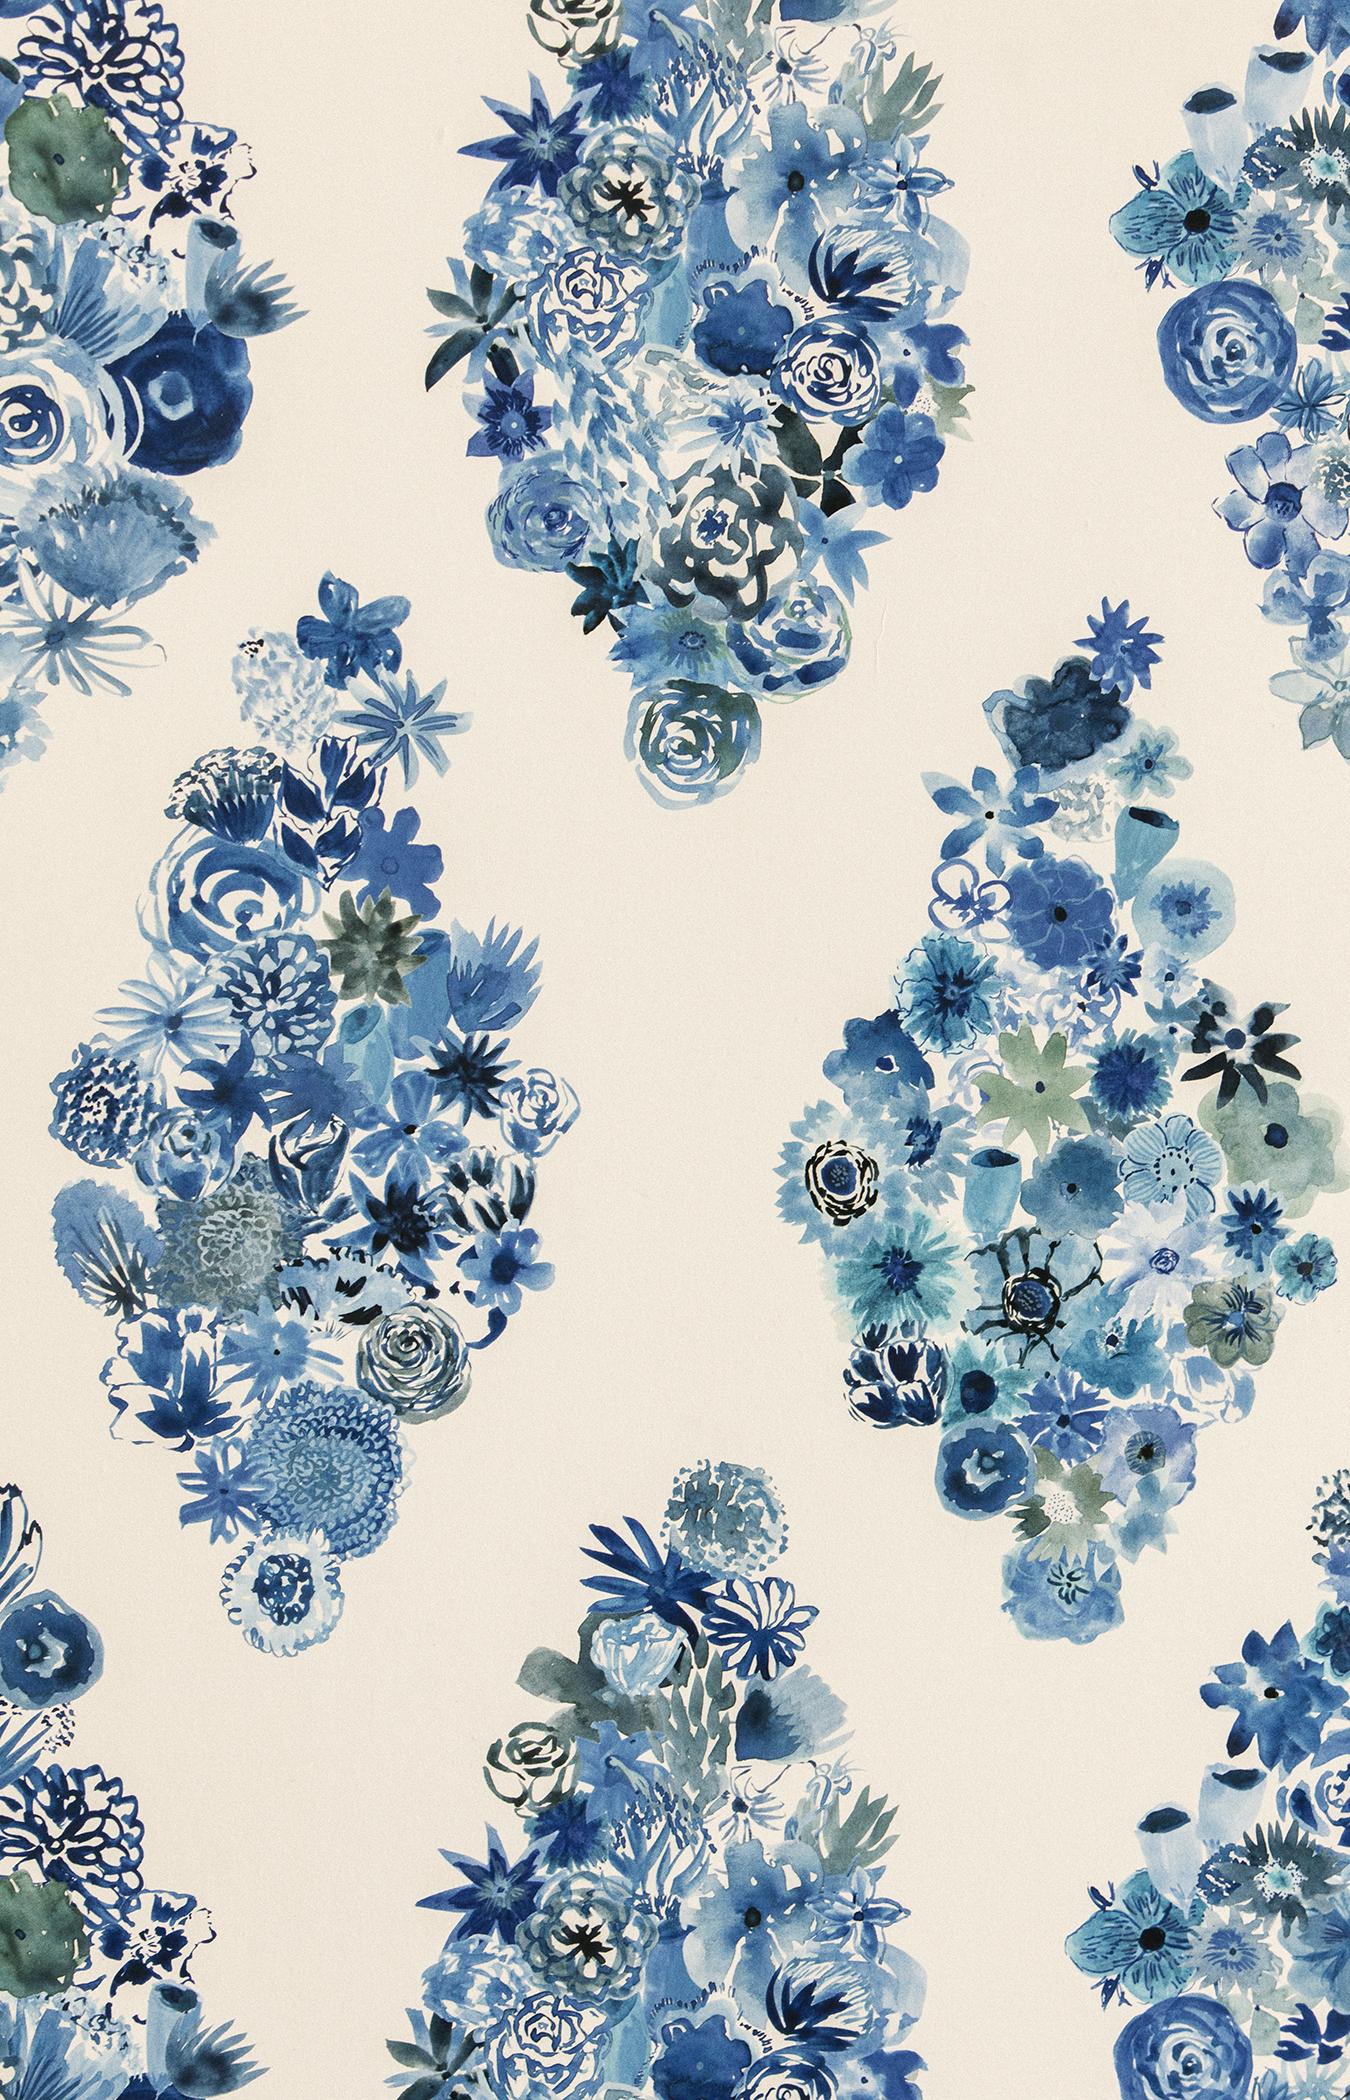 Flora Casbah Blue Floral Wallpaper Flat Vernacular